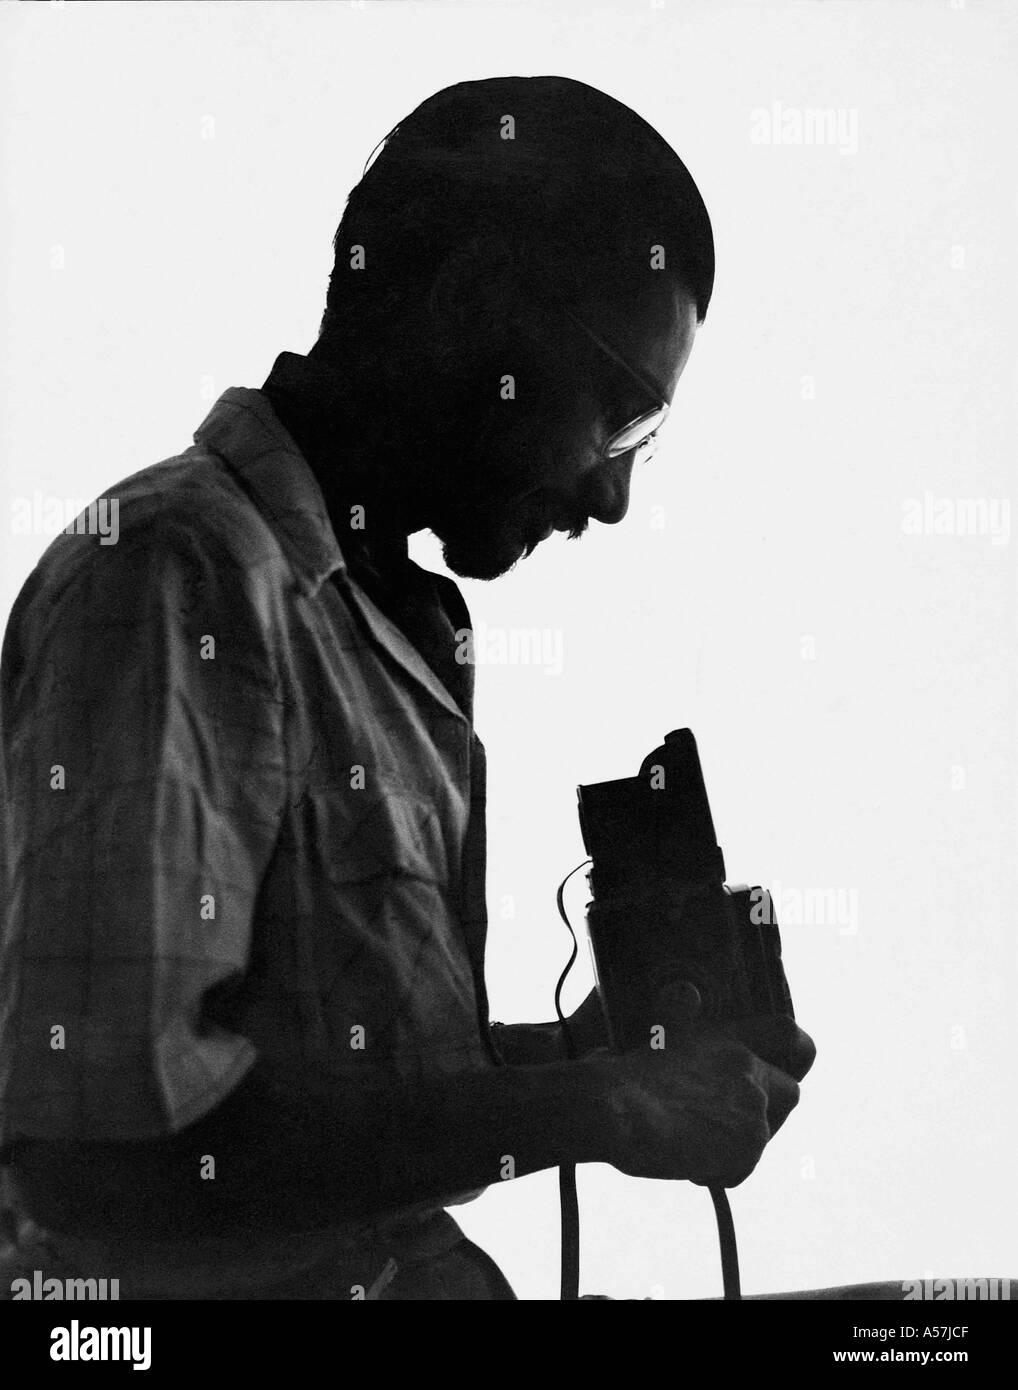 Praful Patel photographer with Rollei camera Stock Photo